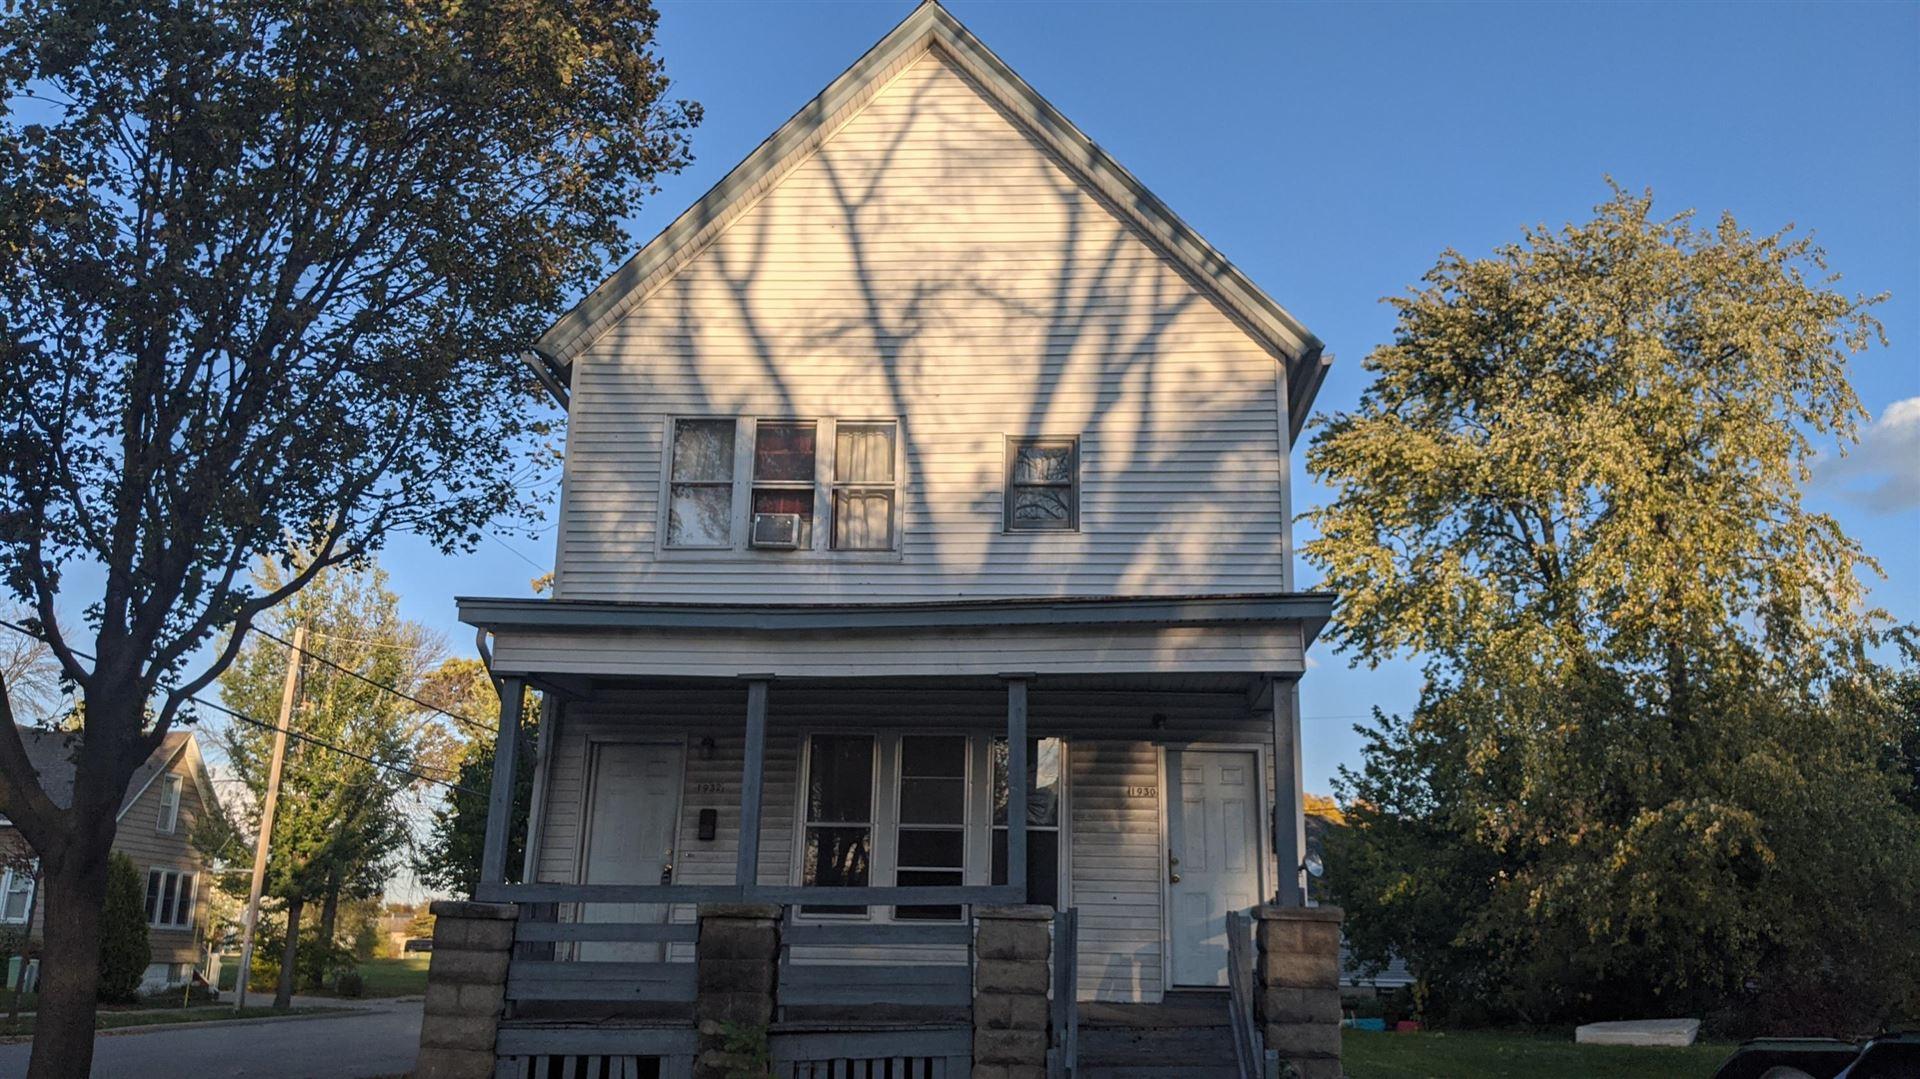 1930 N 14th St #1932, Milwaukee, WI 53205 - #: 1715239